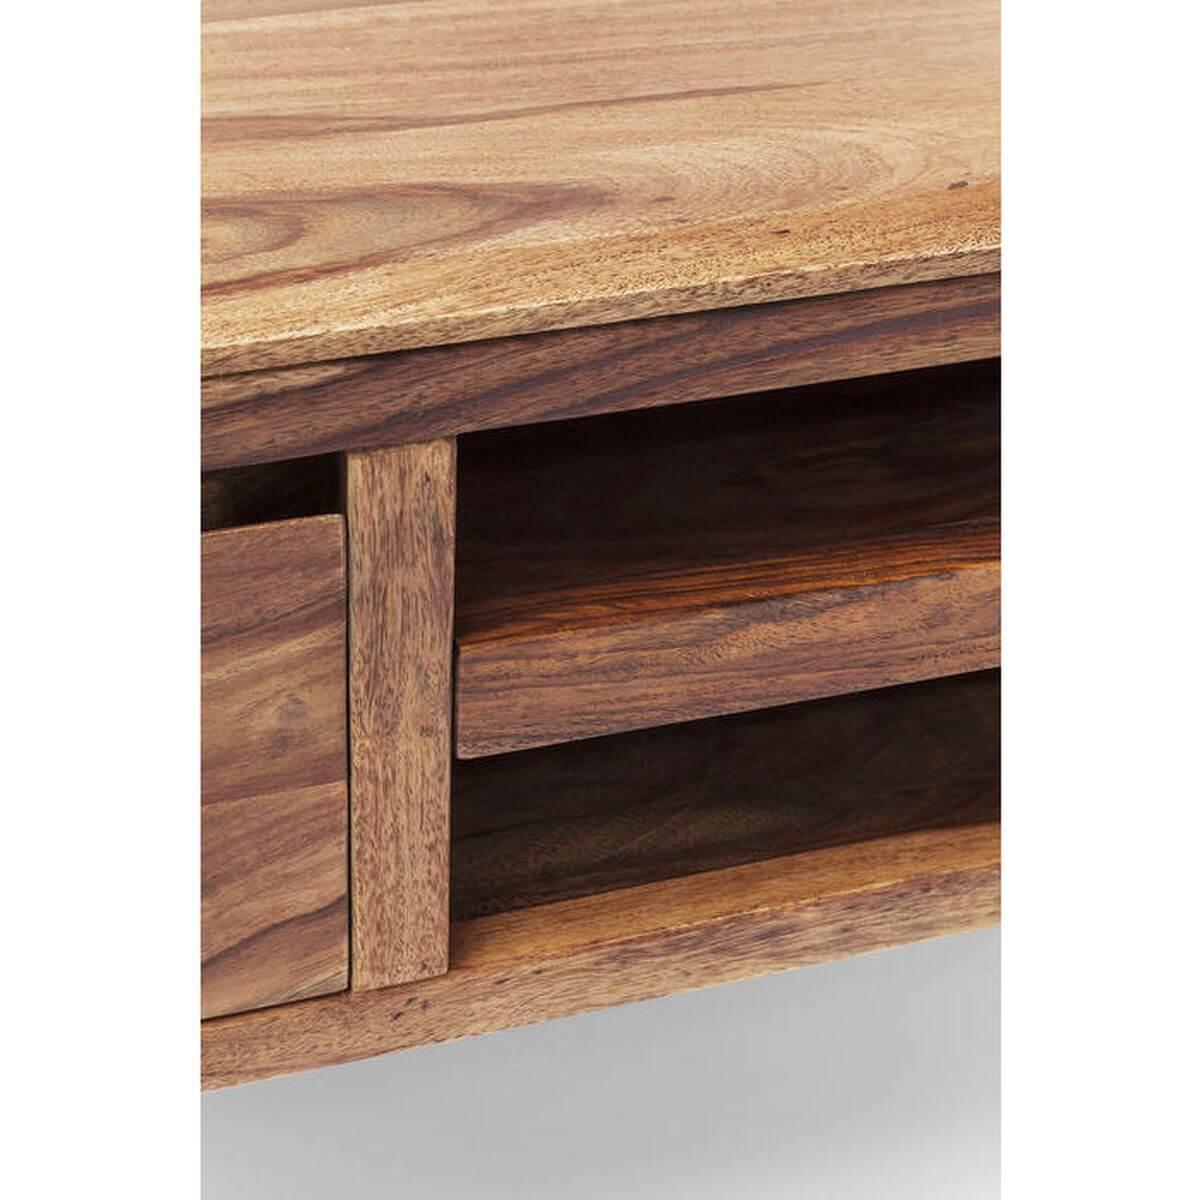 Abitare meuble tv brooklyn kare design nature - Meuble kare design ...